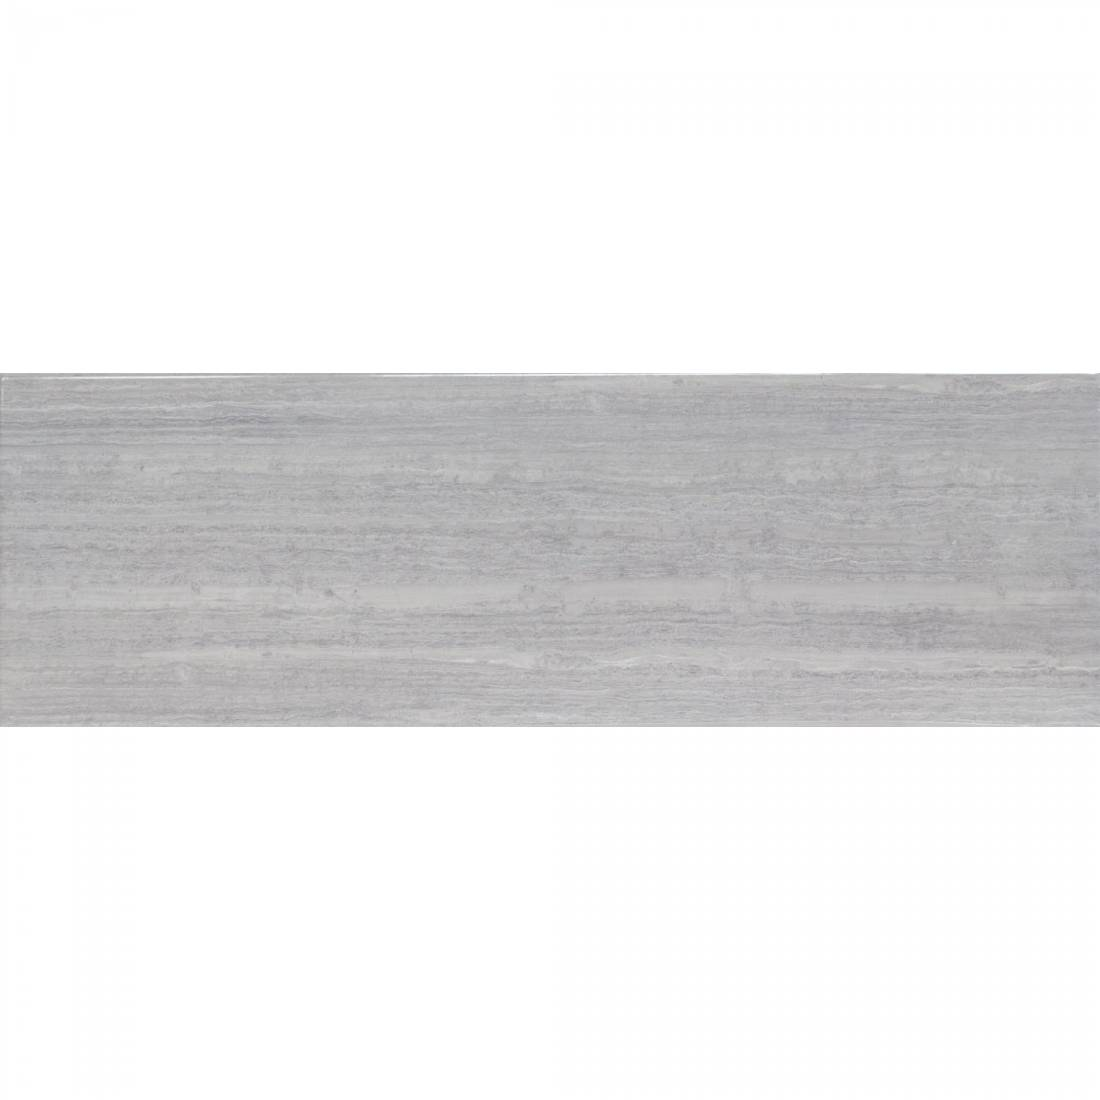 Senso 20x60 Dark Grey Gloss 1